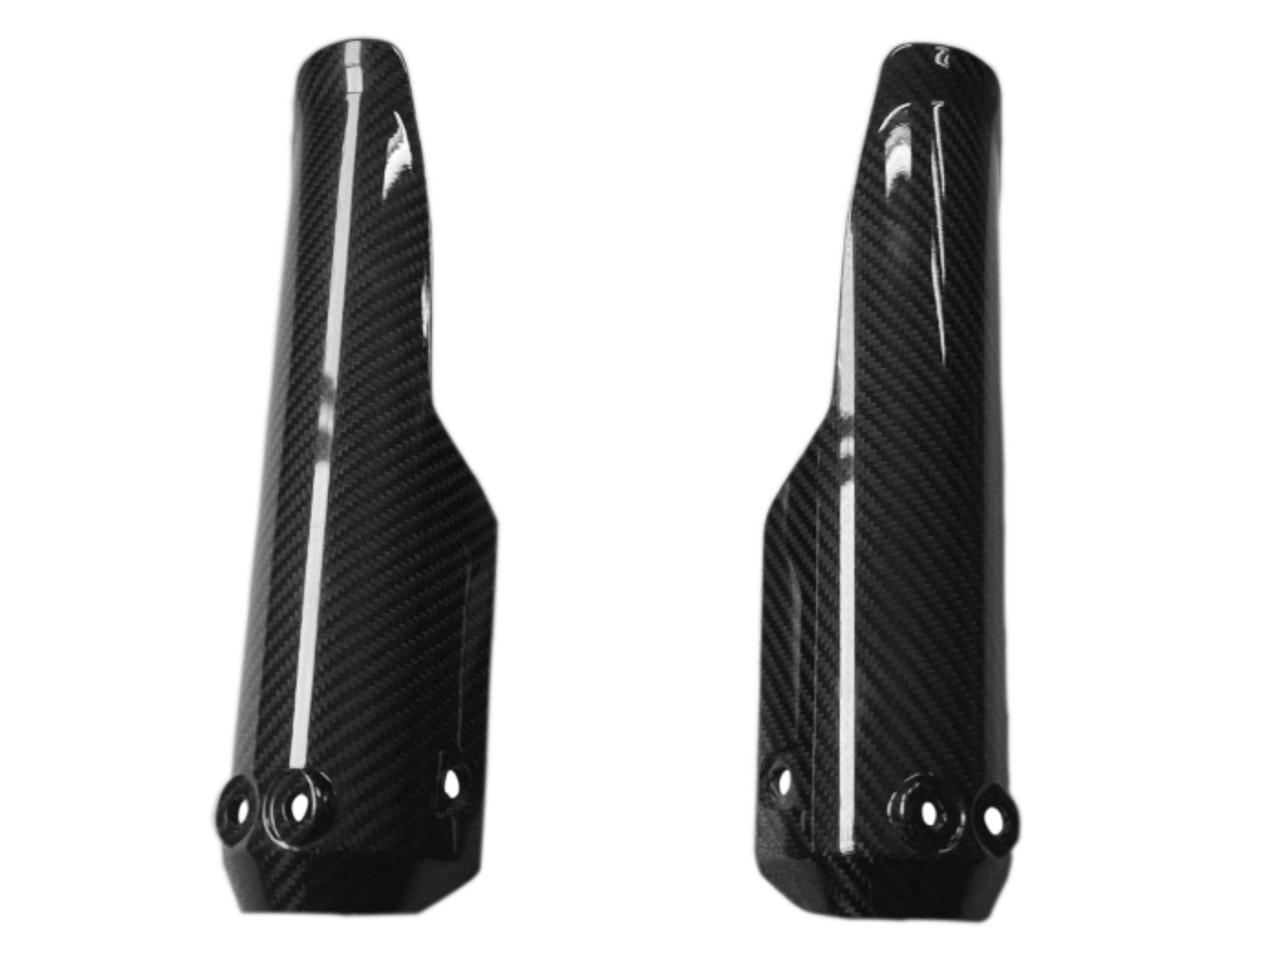 Fork Protectors (Desert Sled) in Glossy Twill Weave Carbon Fiber